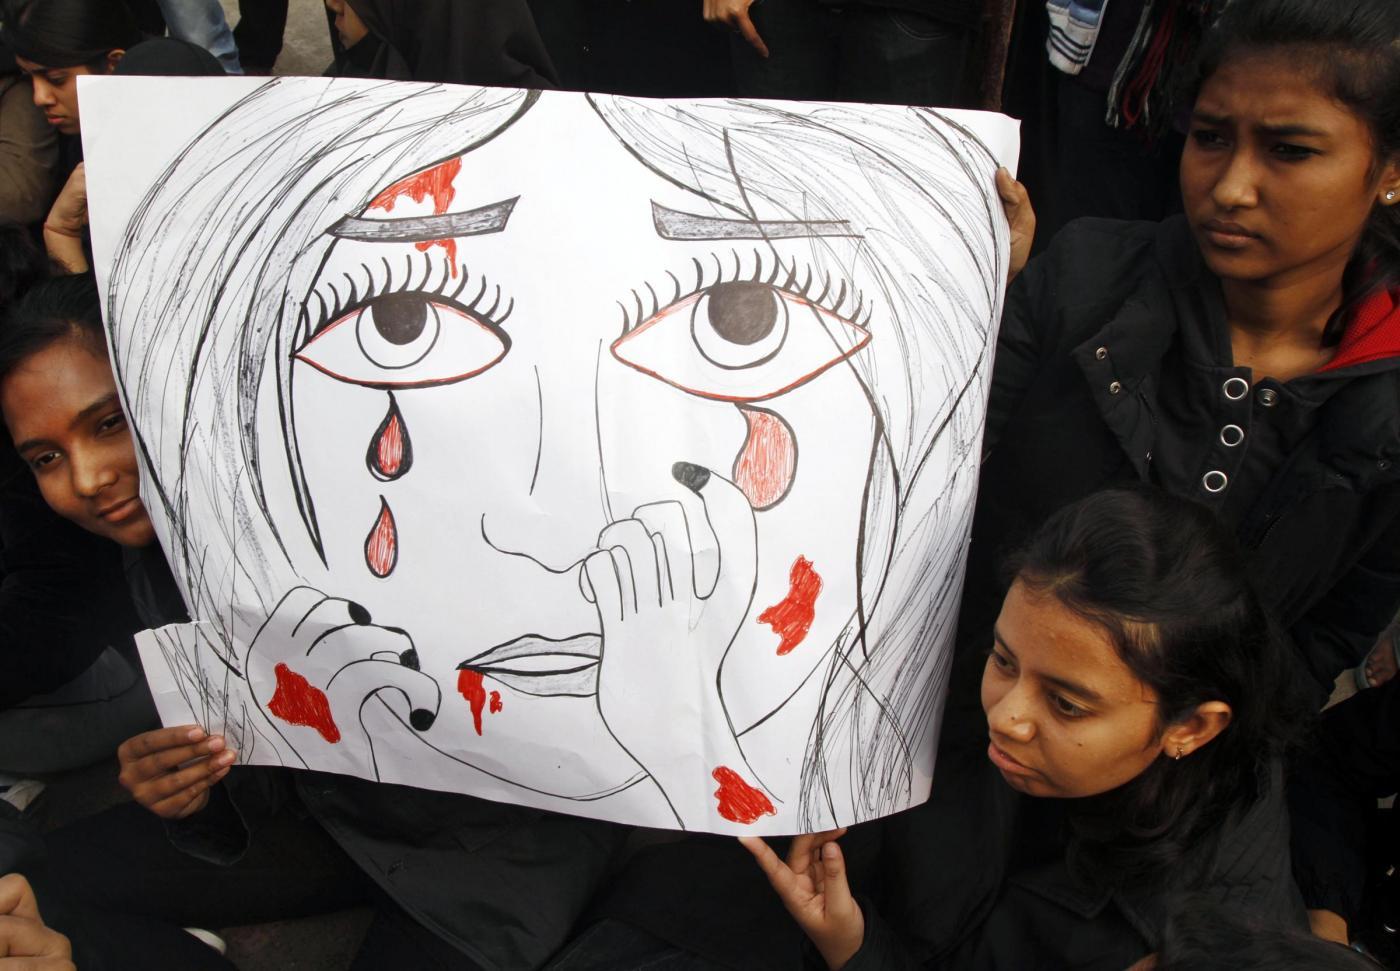 Bambine stuprate